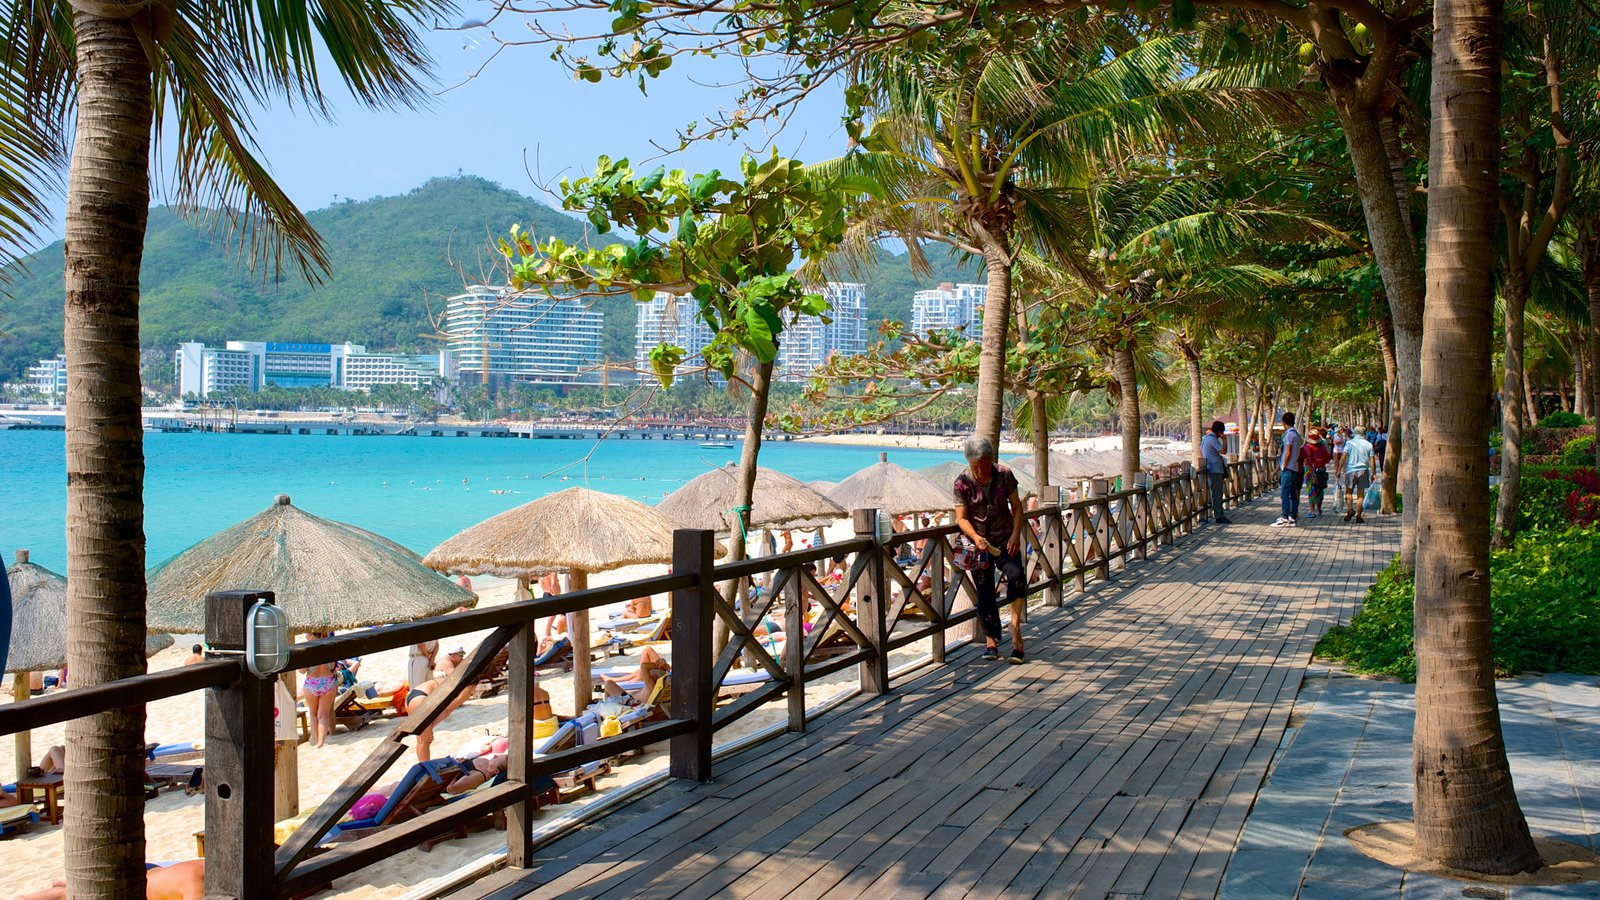 Ялуньване Дадунхае пляжный отдых фото